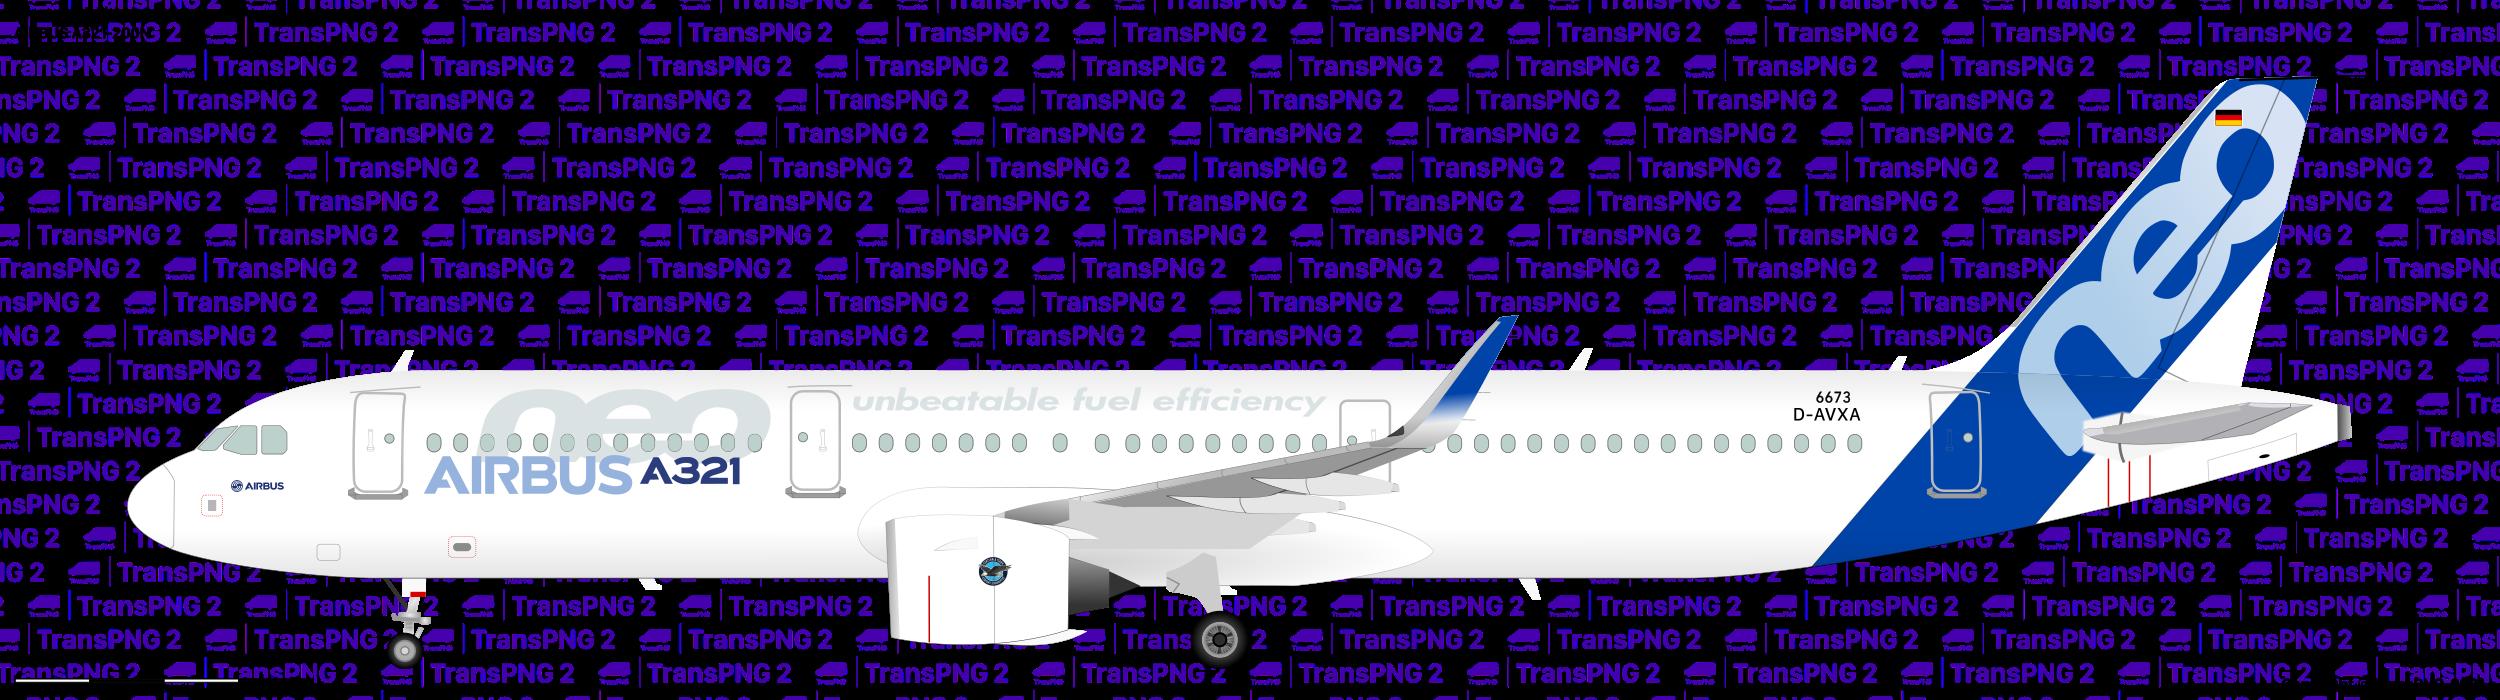 Airplane 25122